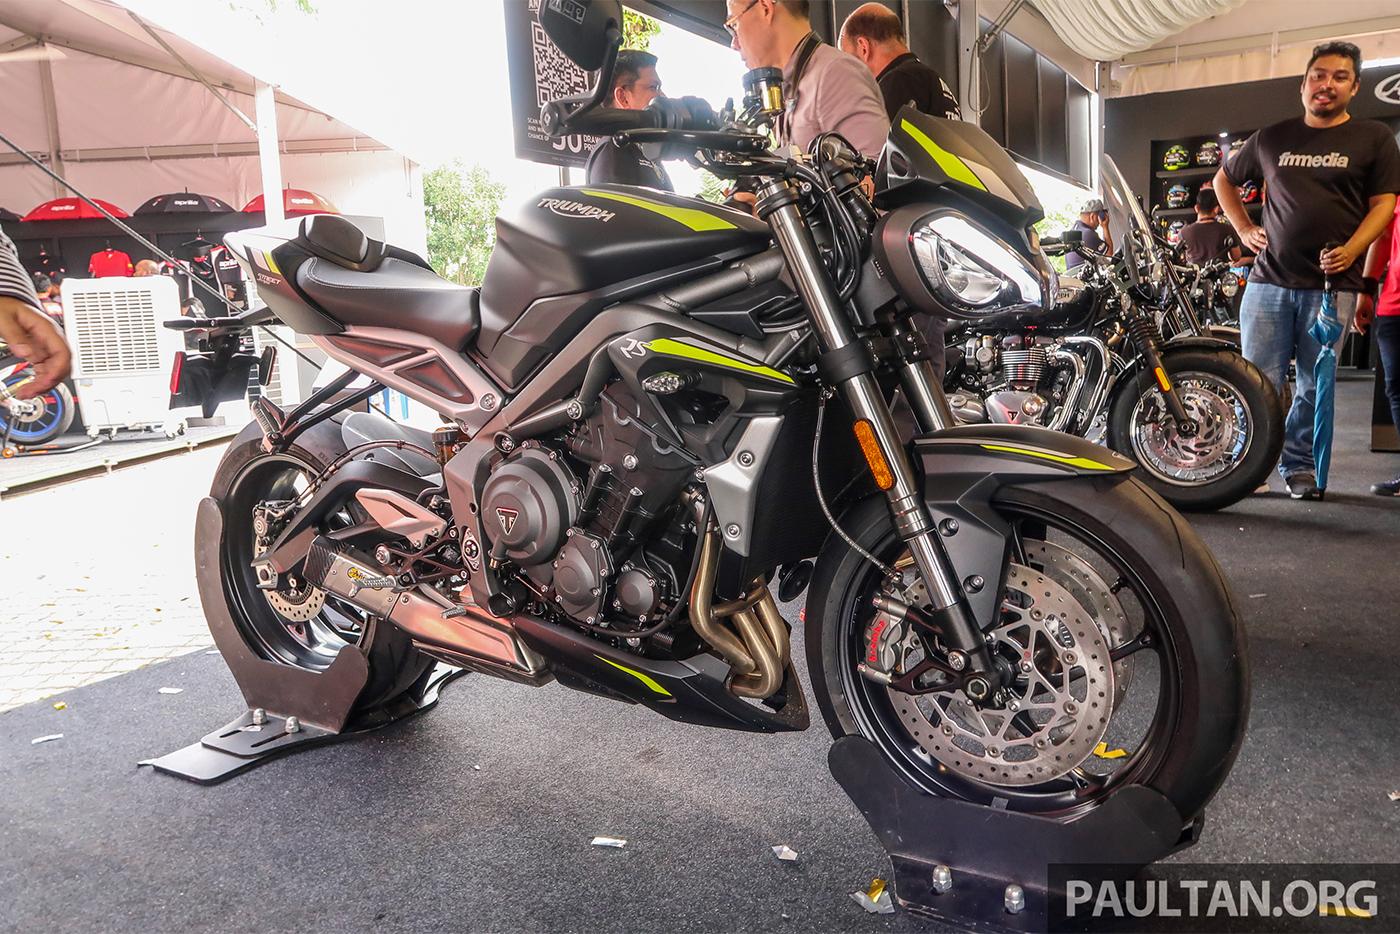 2020-triumph-street-triple-765rs-malaysia-launch-7.jpg